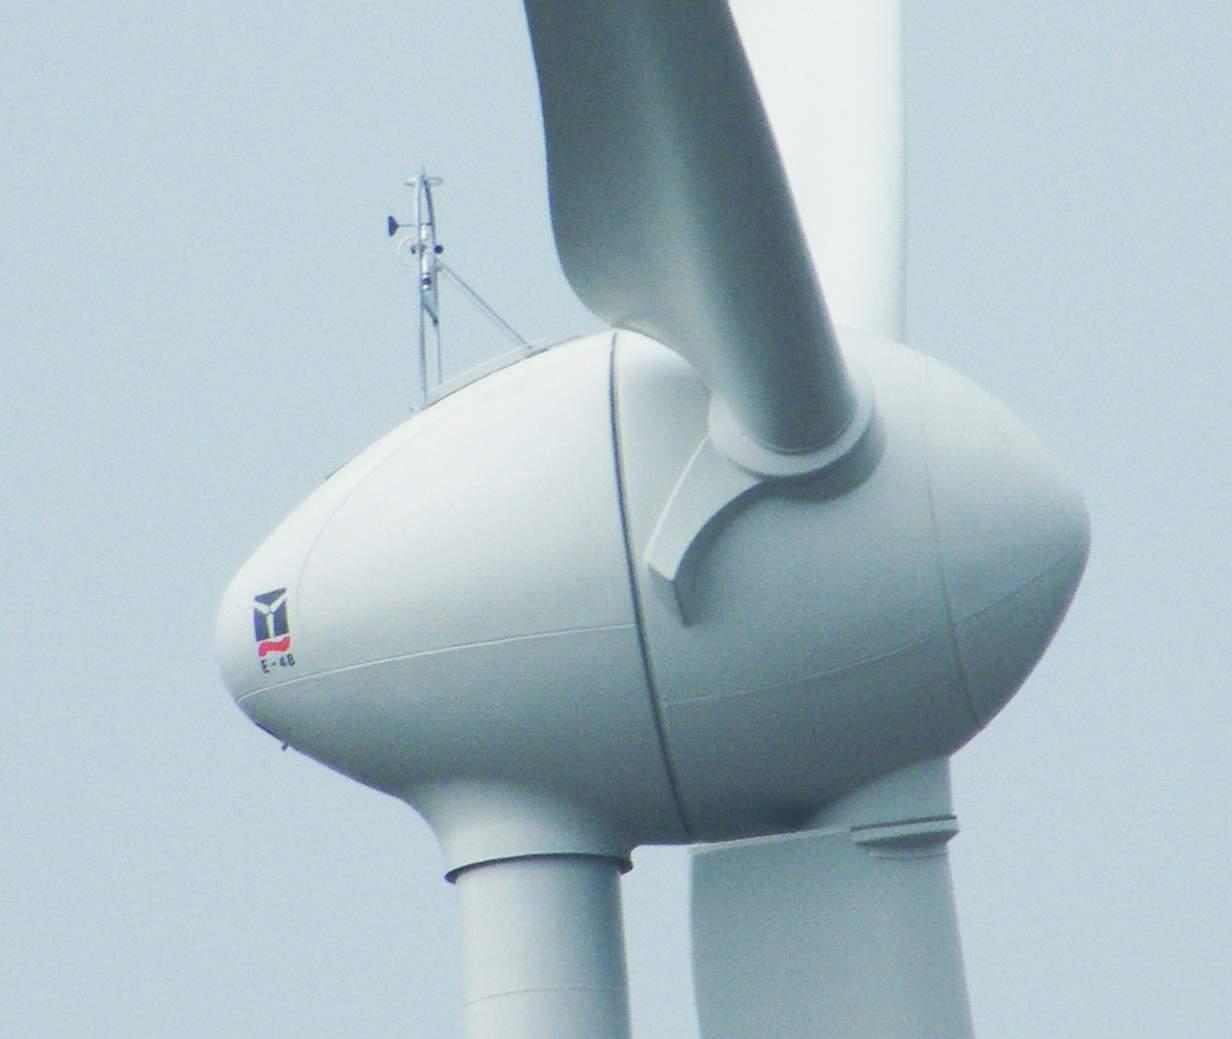 http://www.evwind.es/wp-content/uploads/2013/01/ENERCON-E-92-series.jpg